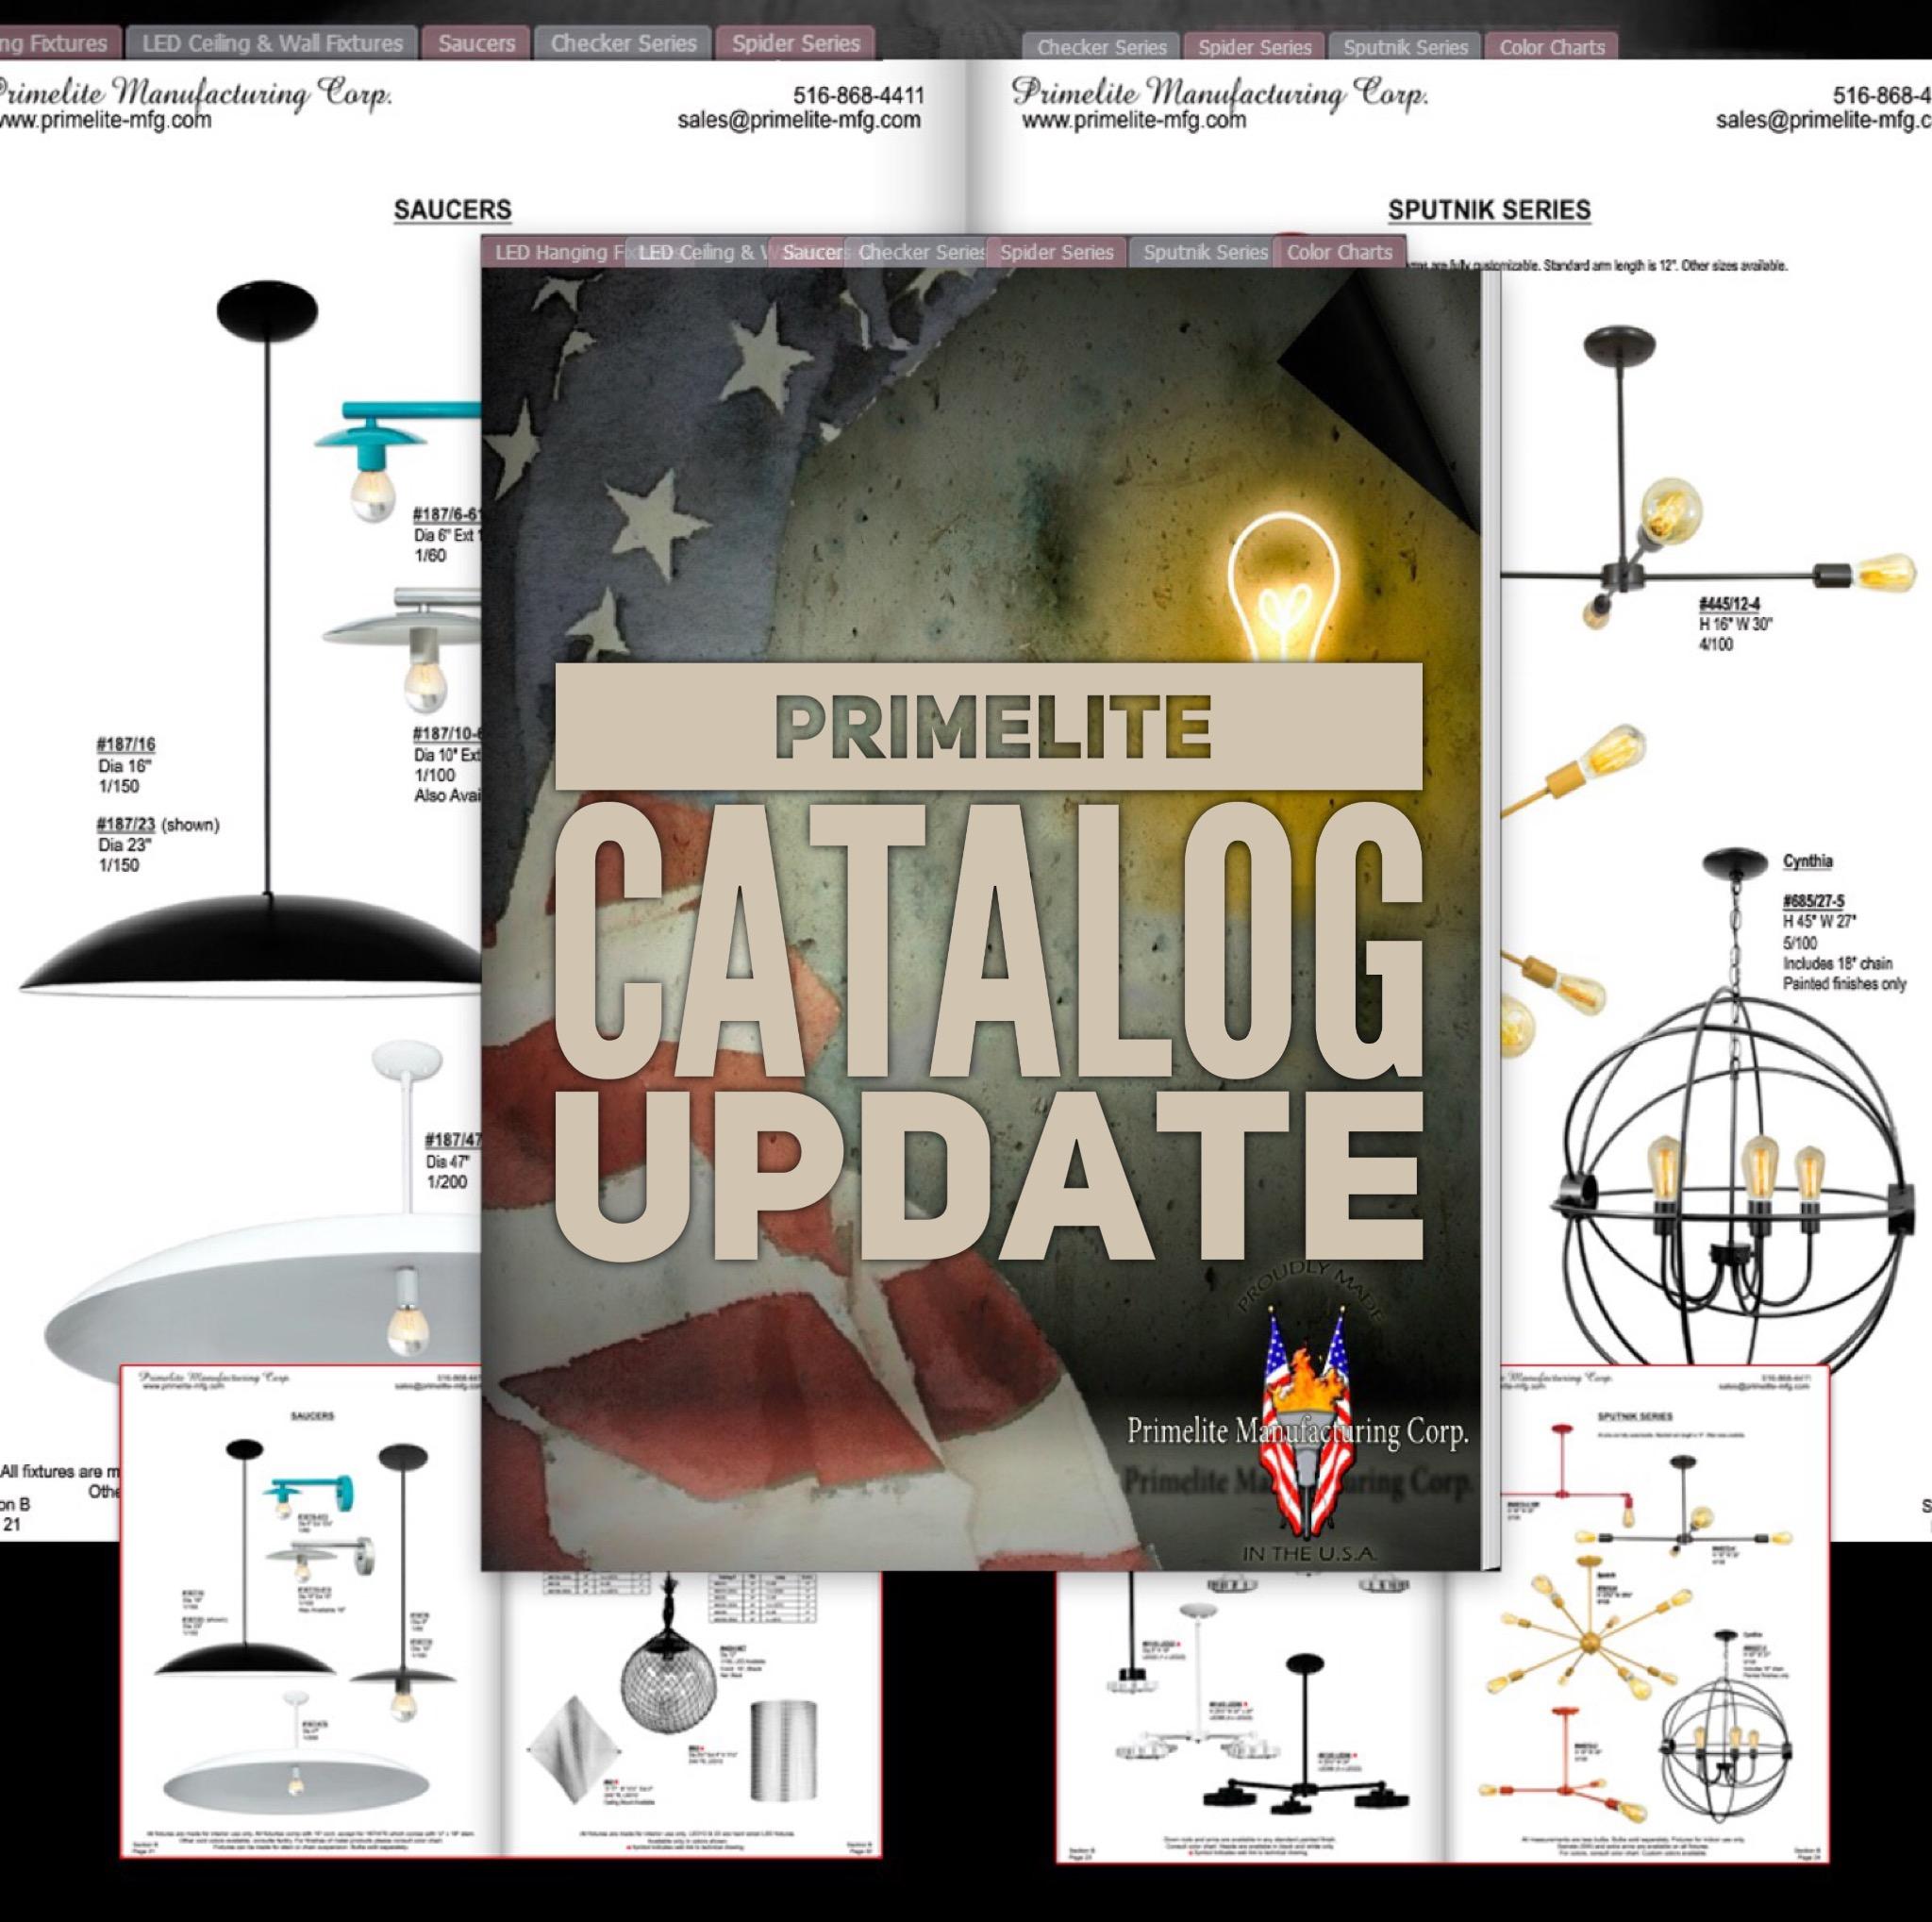 Primelite Mfg - Graphic promoting online catalog update